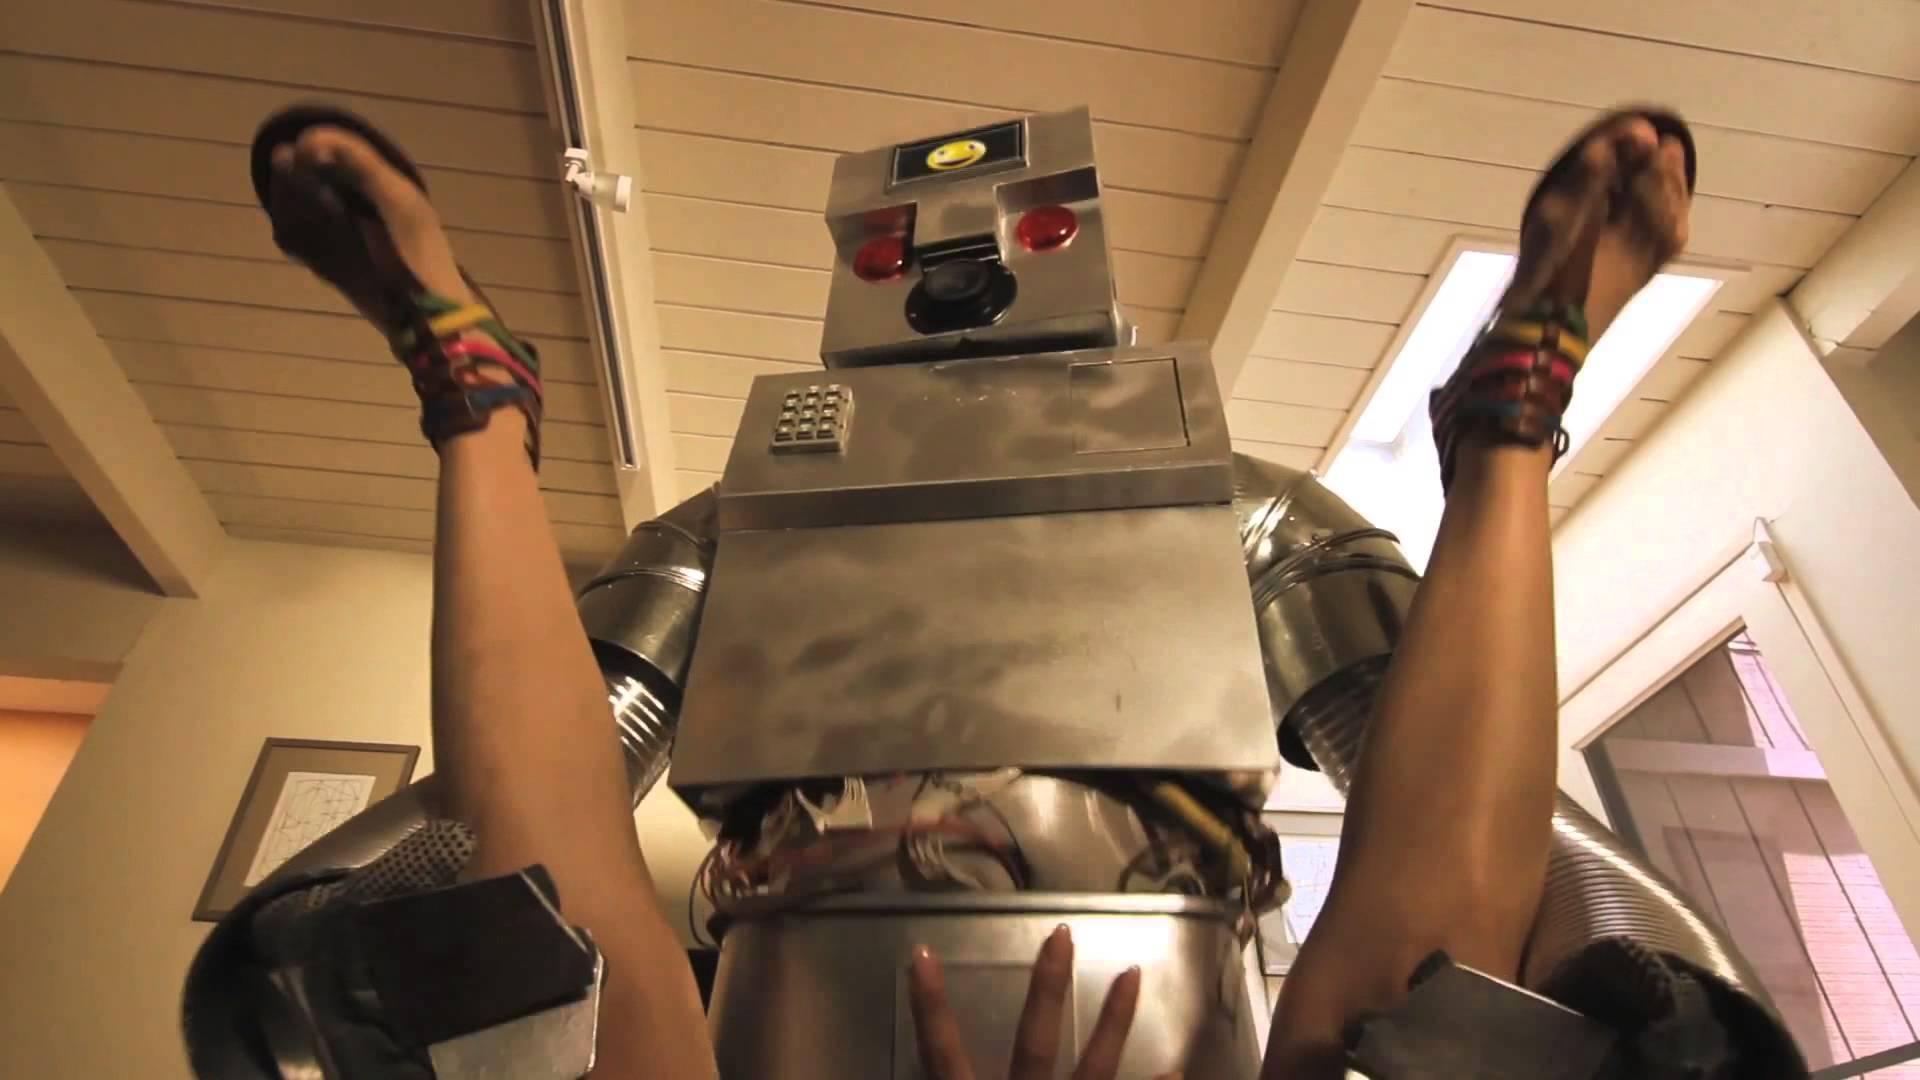 Э робот секс андроид 23 фотография